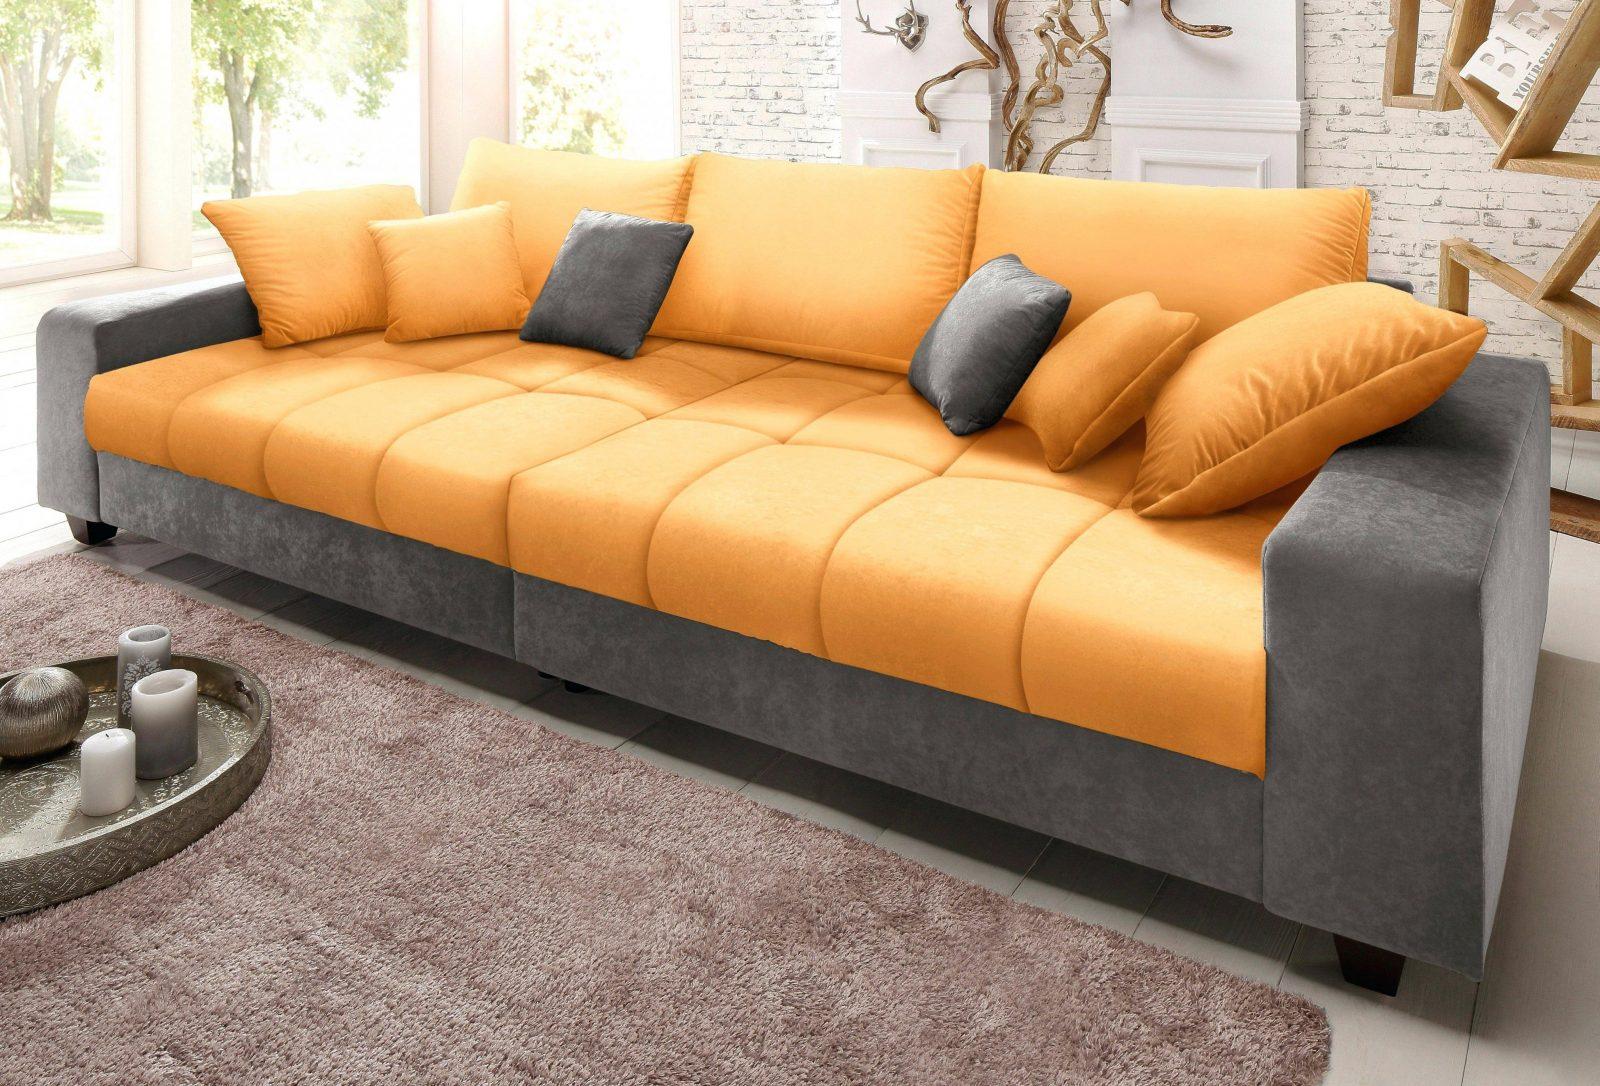 Home Affair Sofa Affaire Big Agreenwicha Otto Couch Glamour – Clibre von Otto Big Sofa Mit Bettfunktion Bild